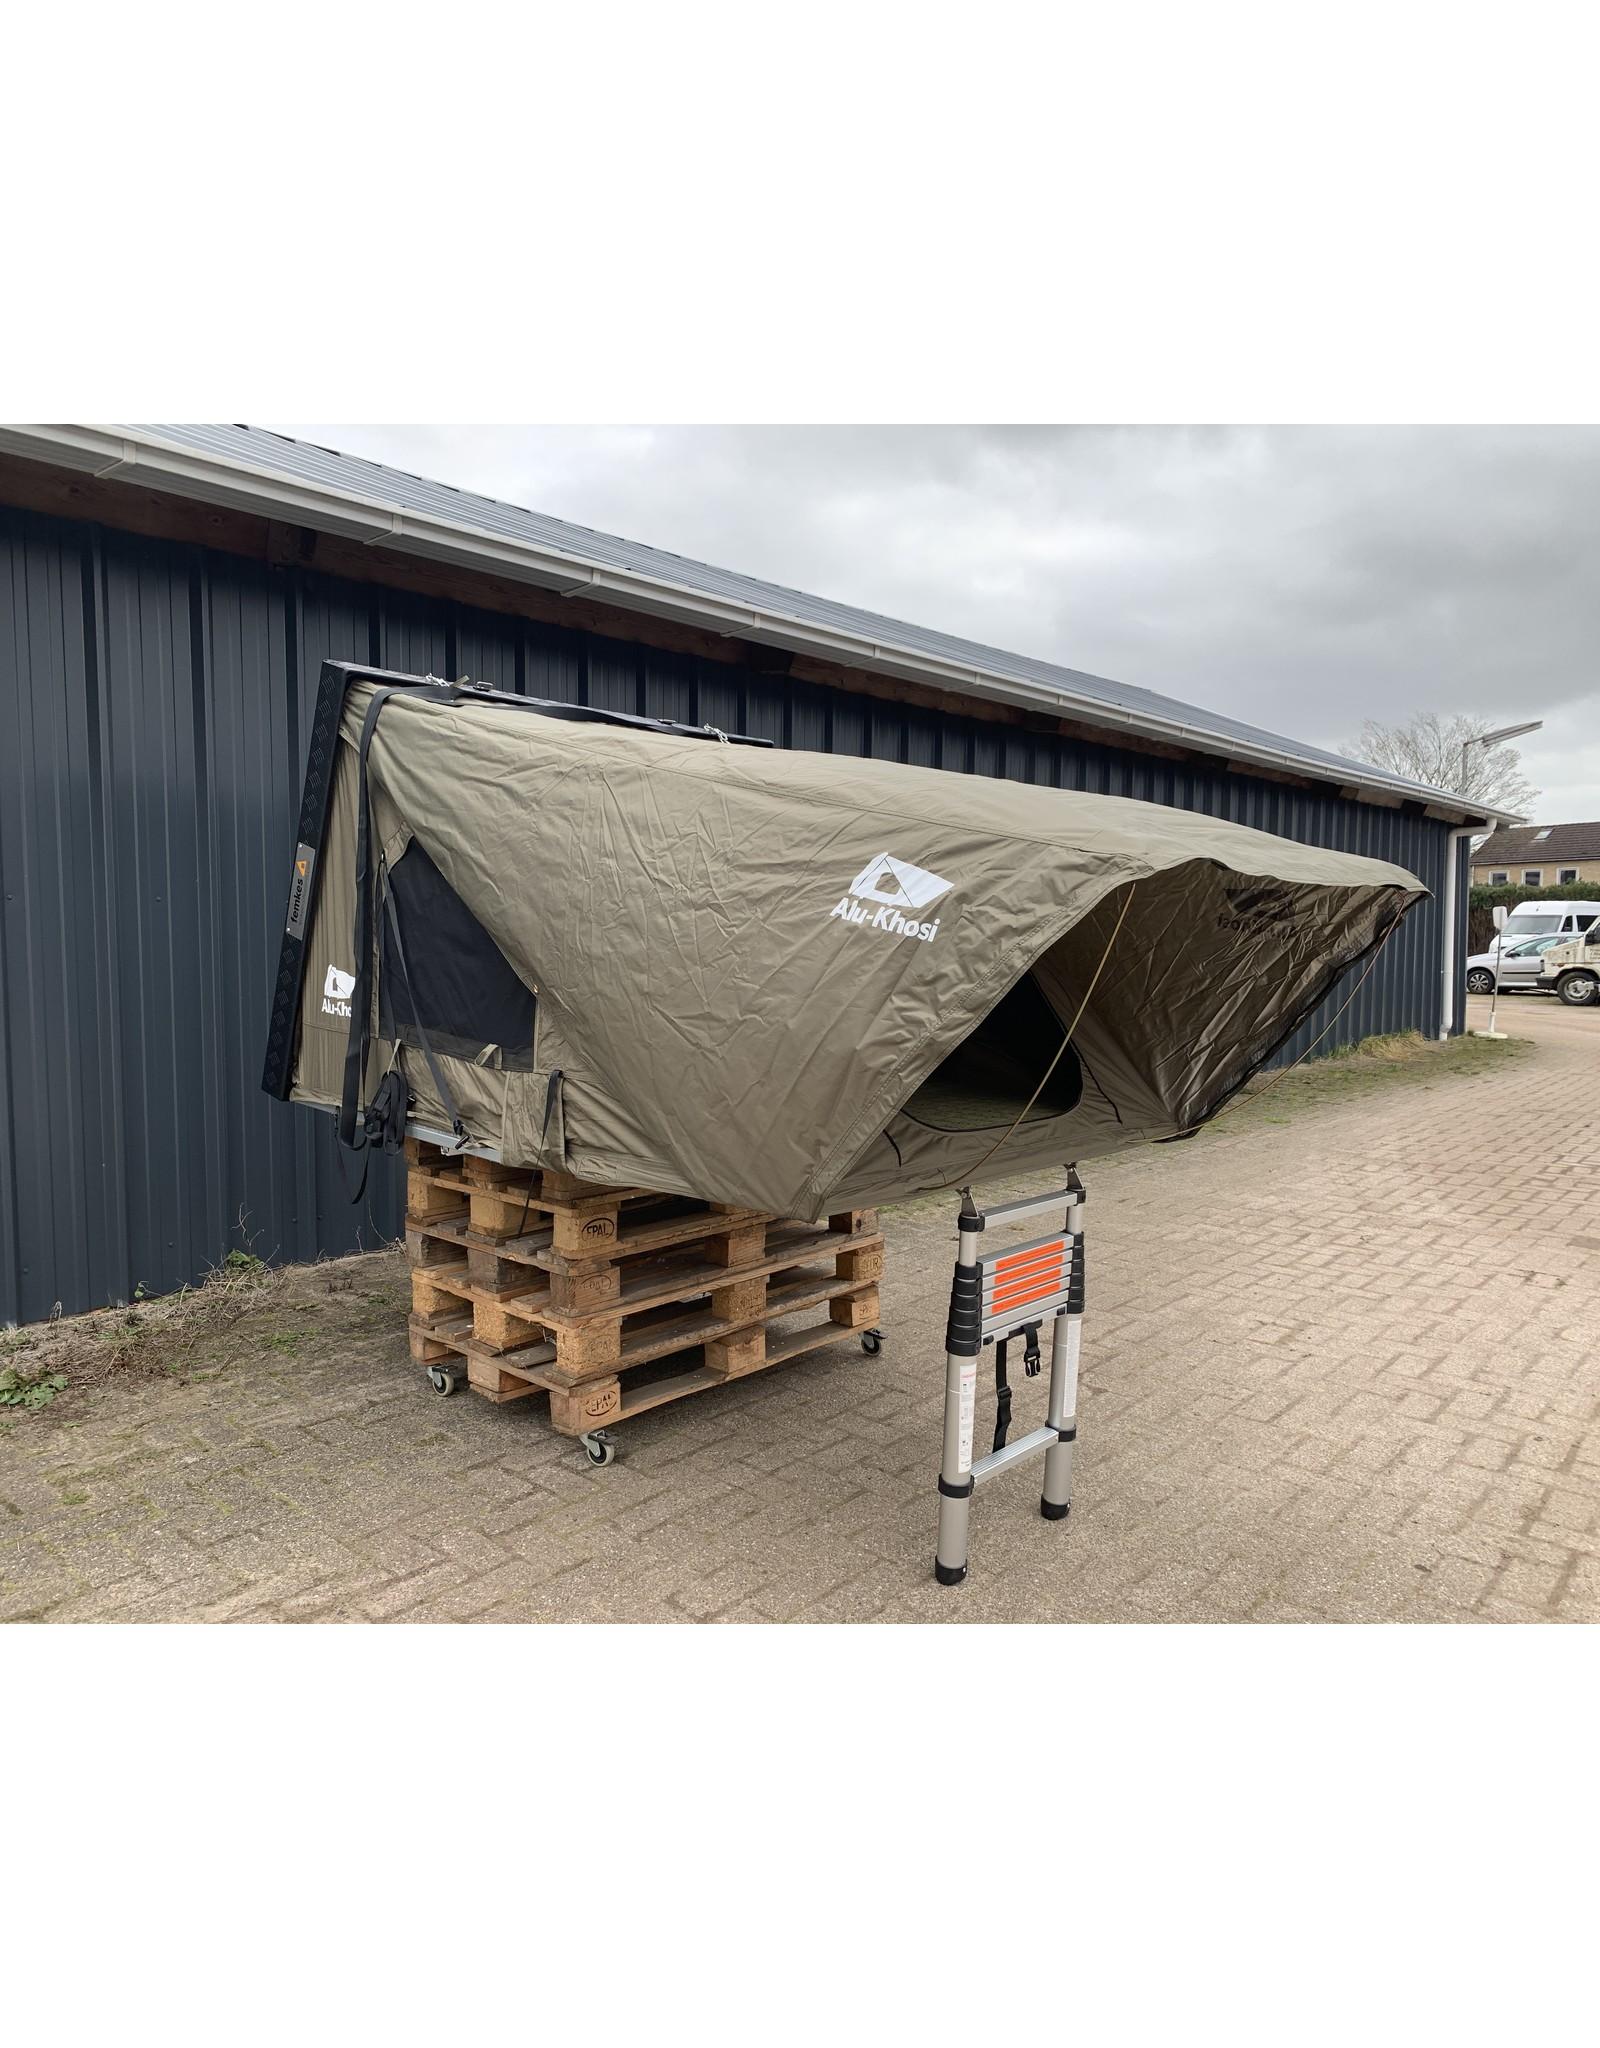 Femkes Alu Dachzelt Alu-Khosi mit 300x350cm Markise